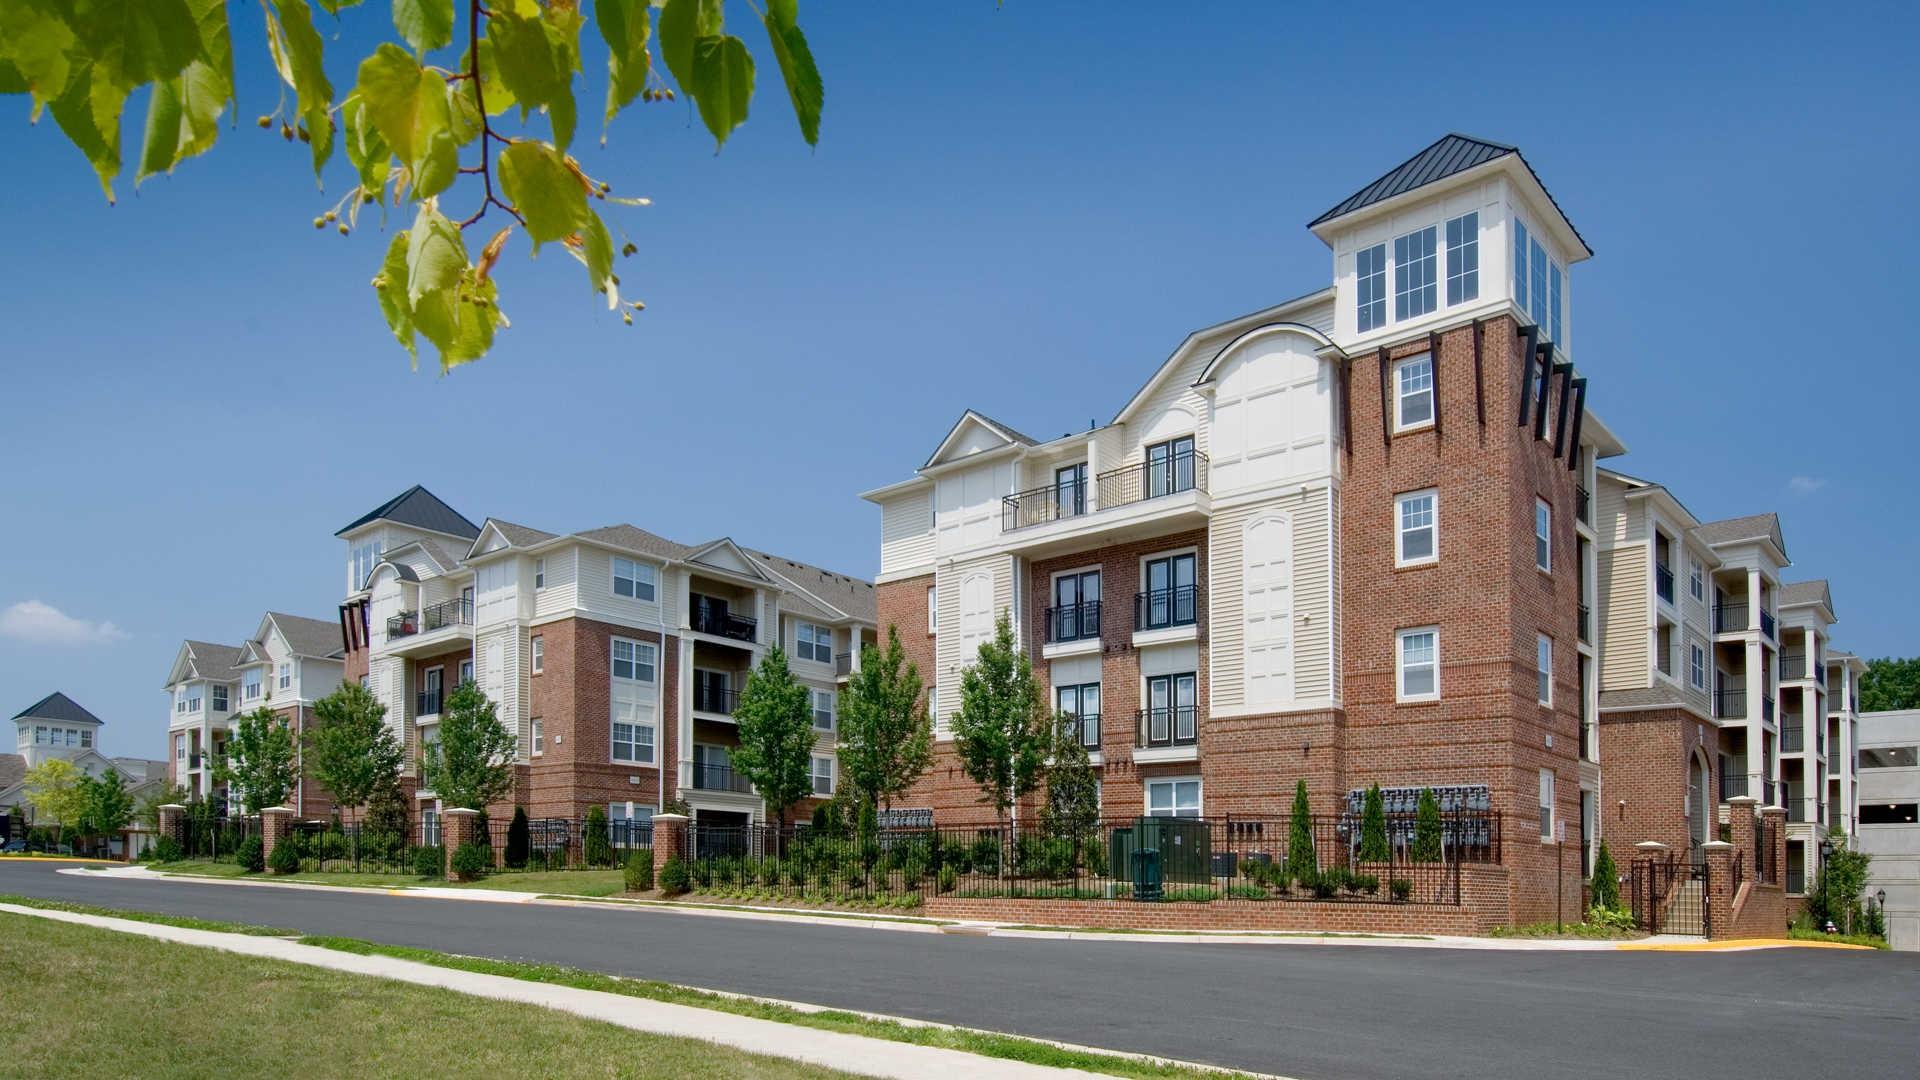 Apartments Near GMU Fairchase for George Mason University Students in Fairfax, VA